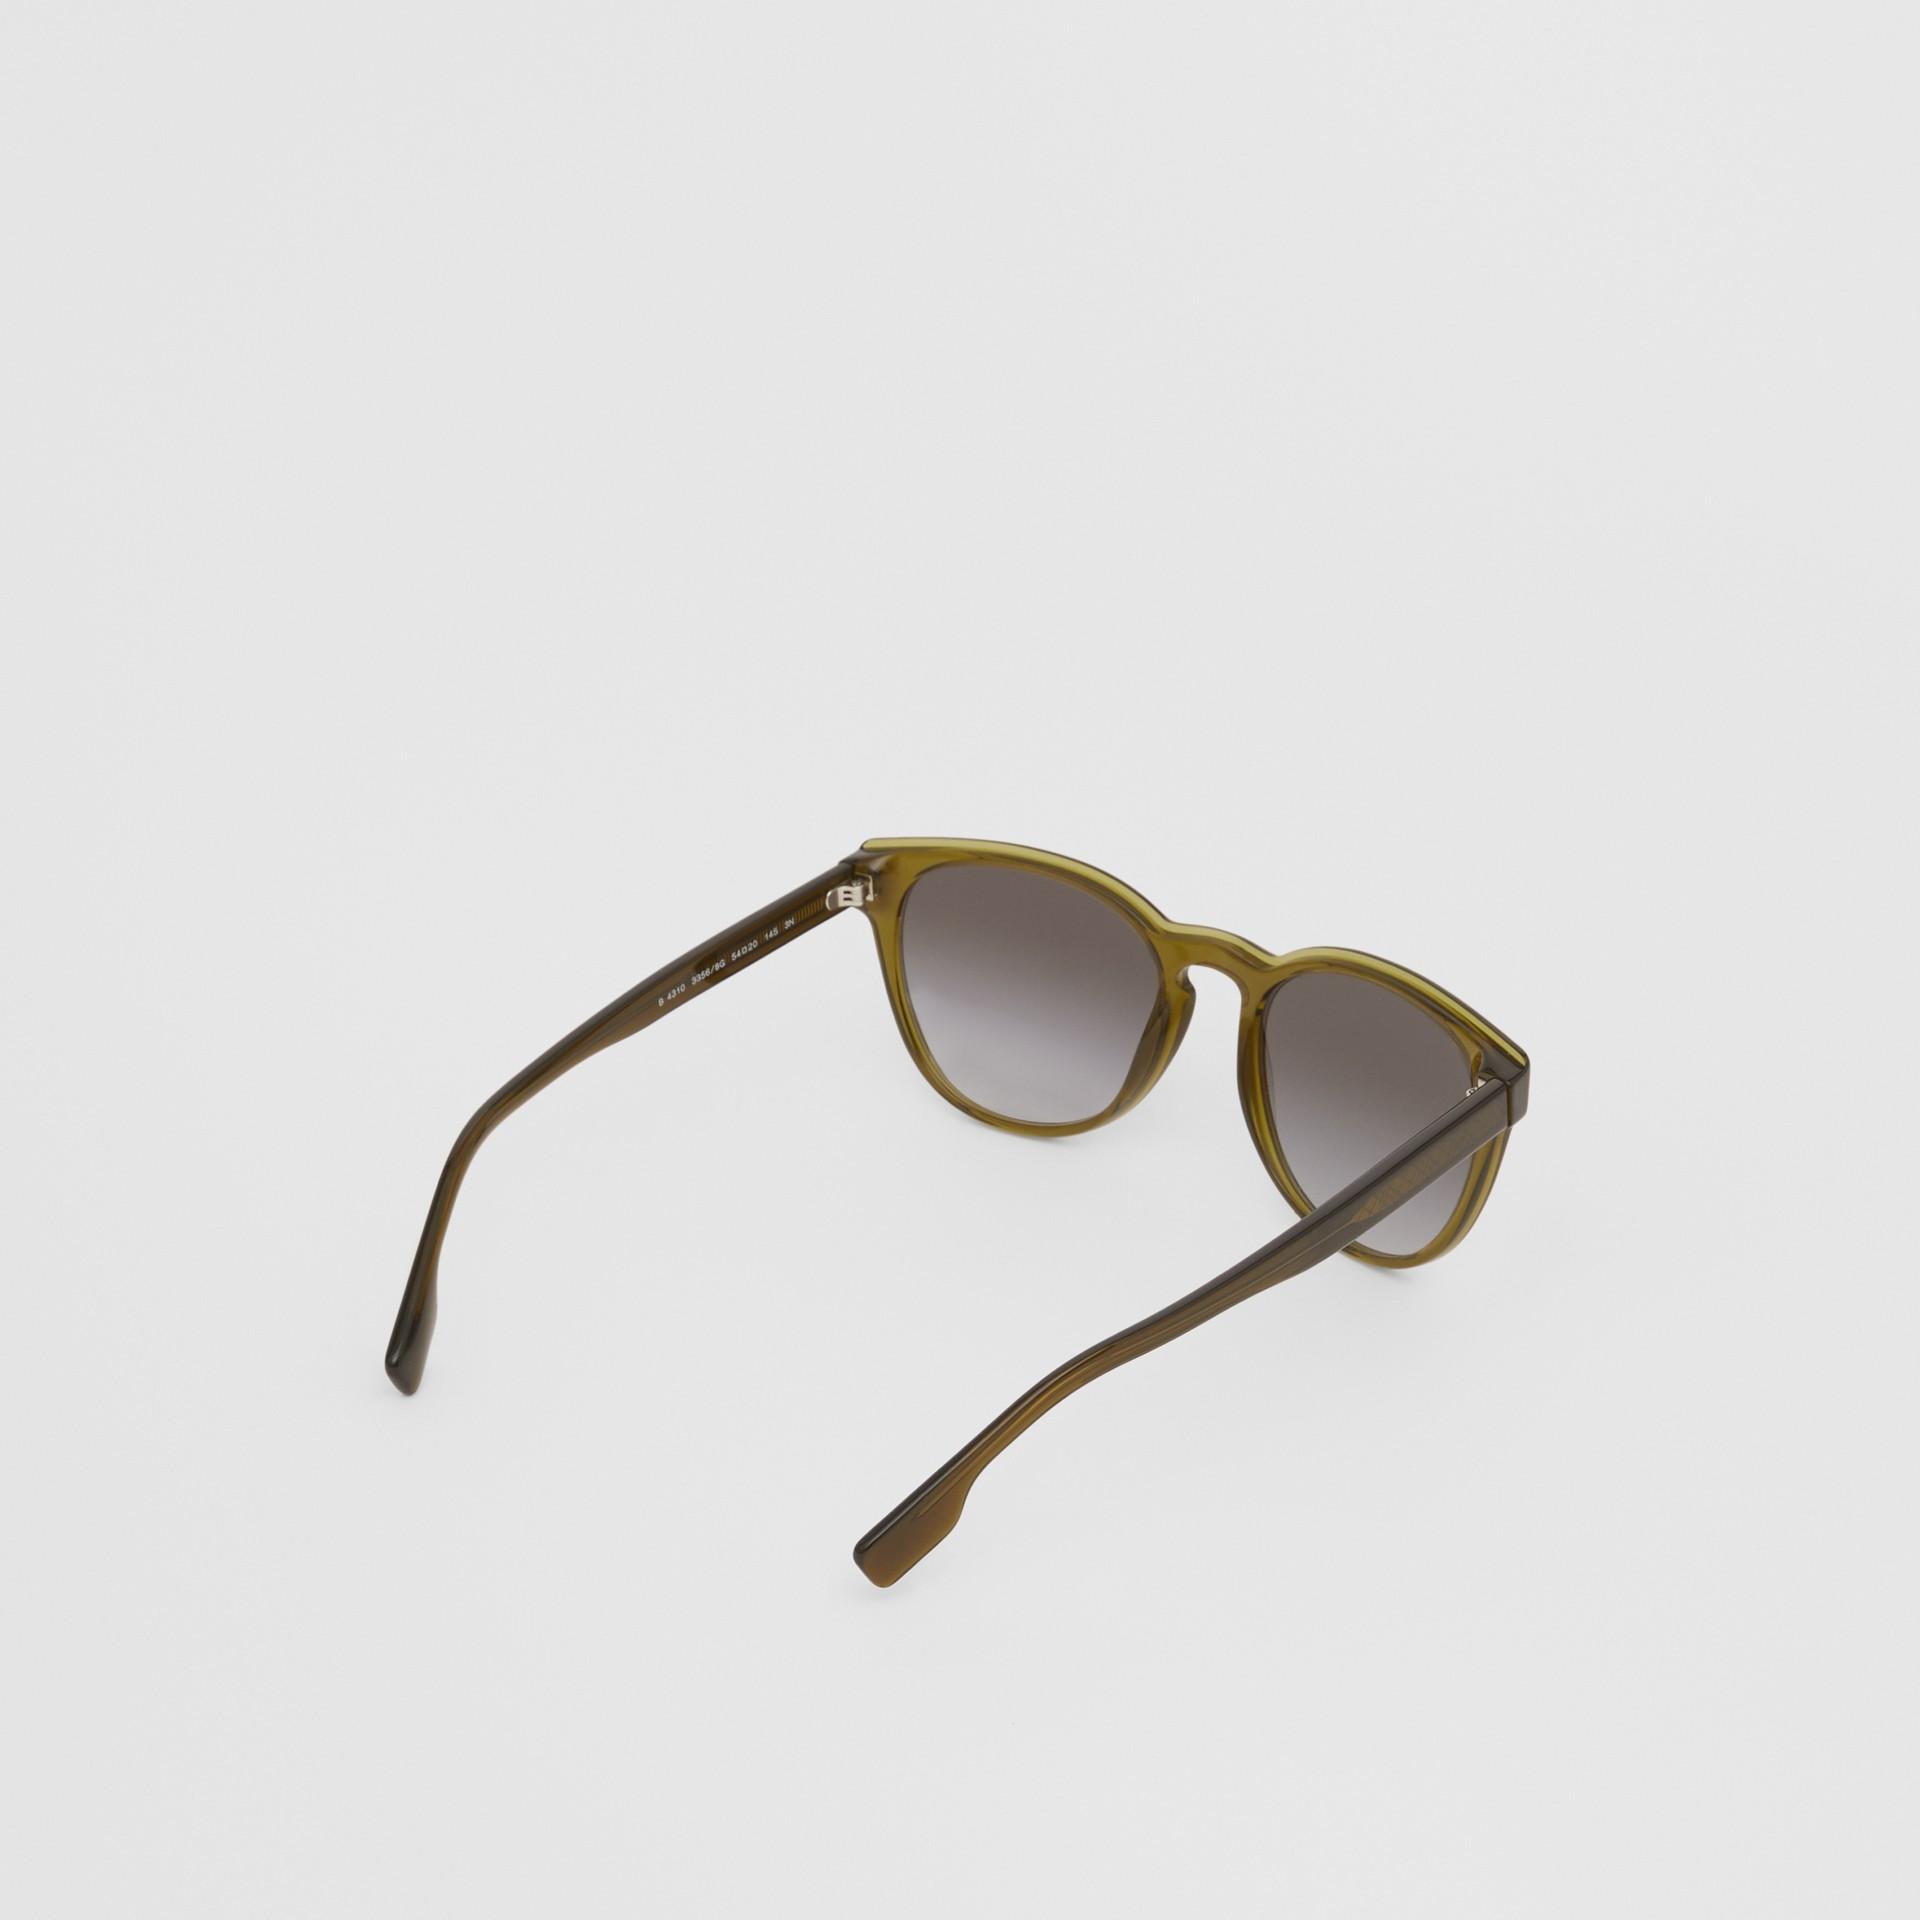 Round Frame Sunglasses in Olive - Men | Burberry Australia - gallery image 3